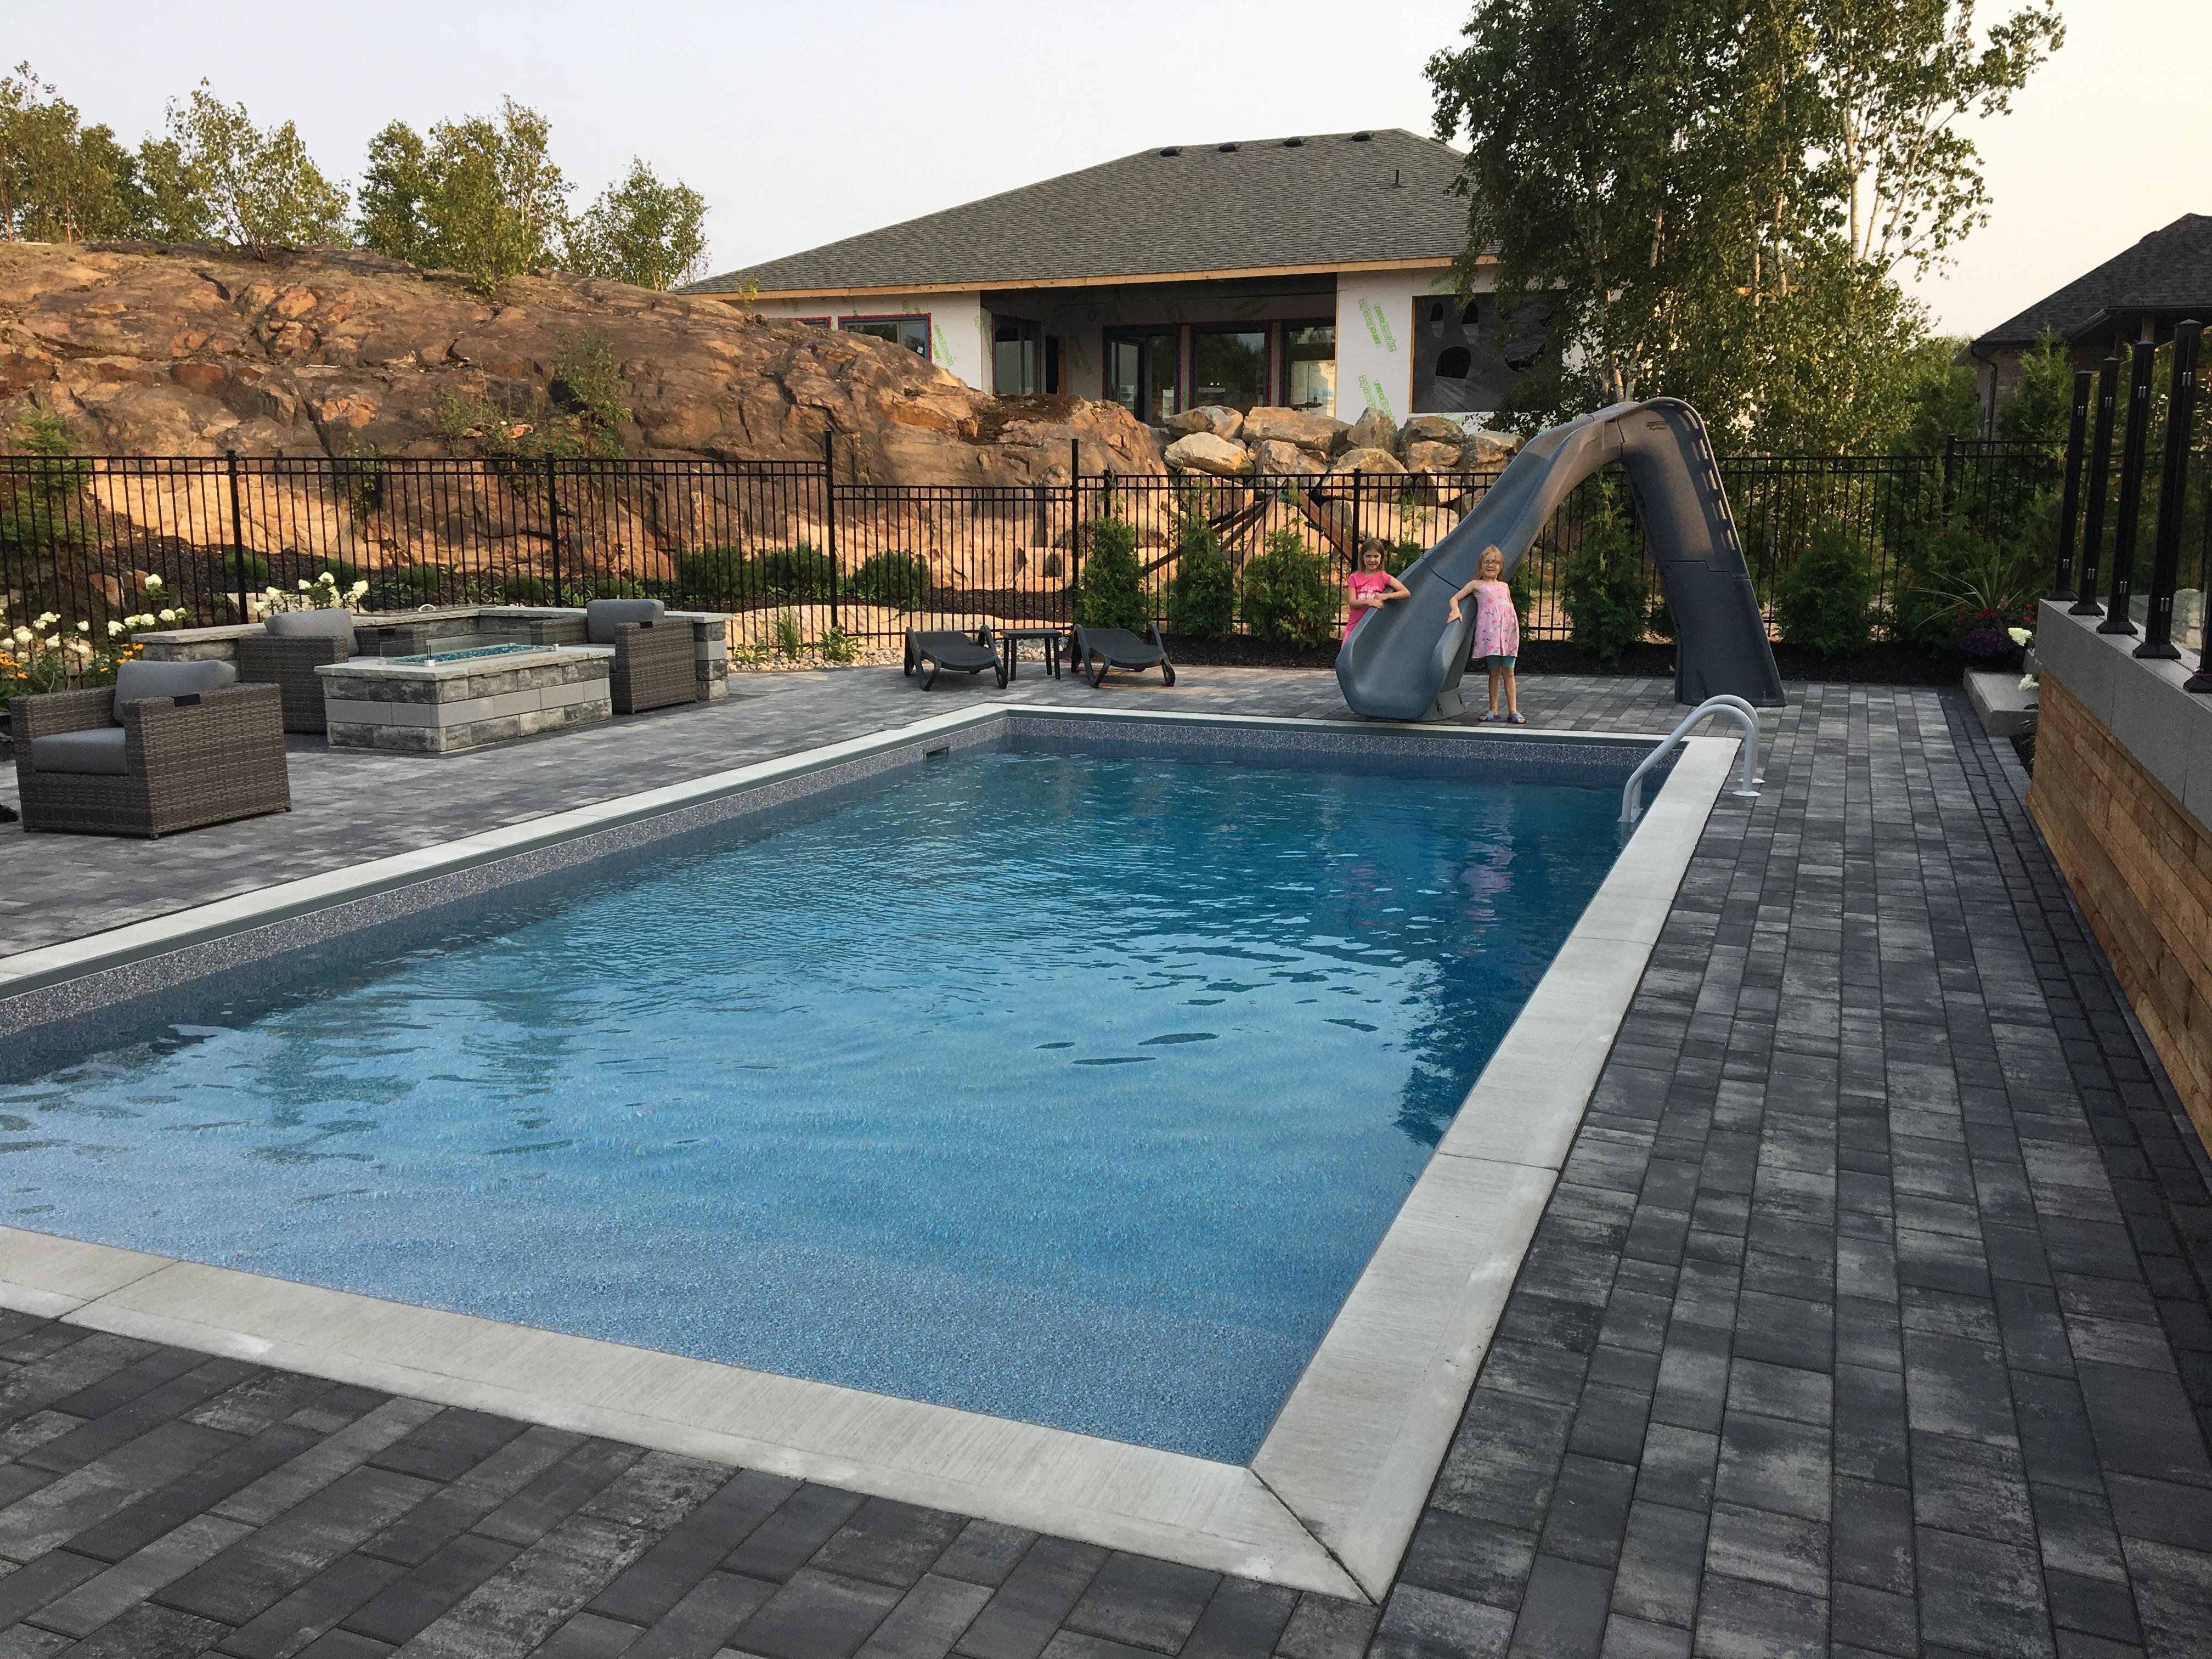 Pool & pool house3